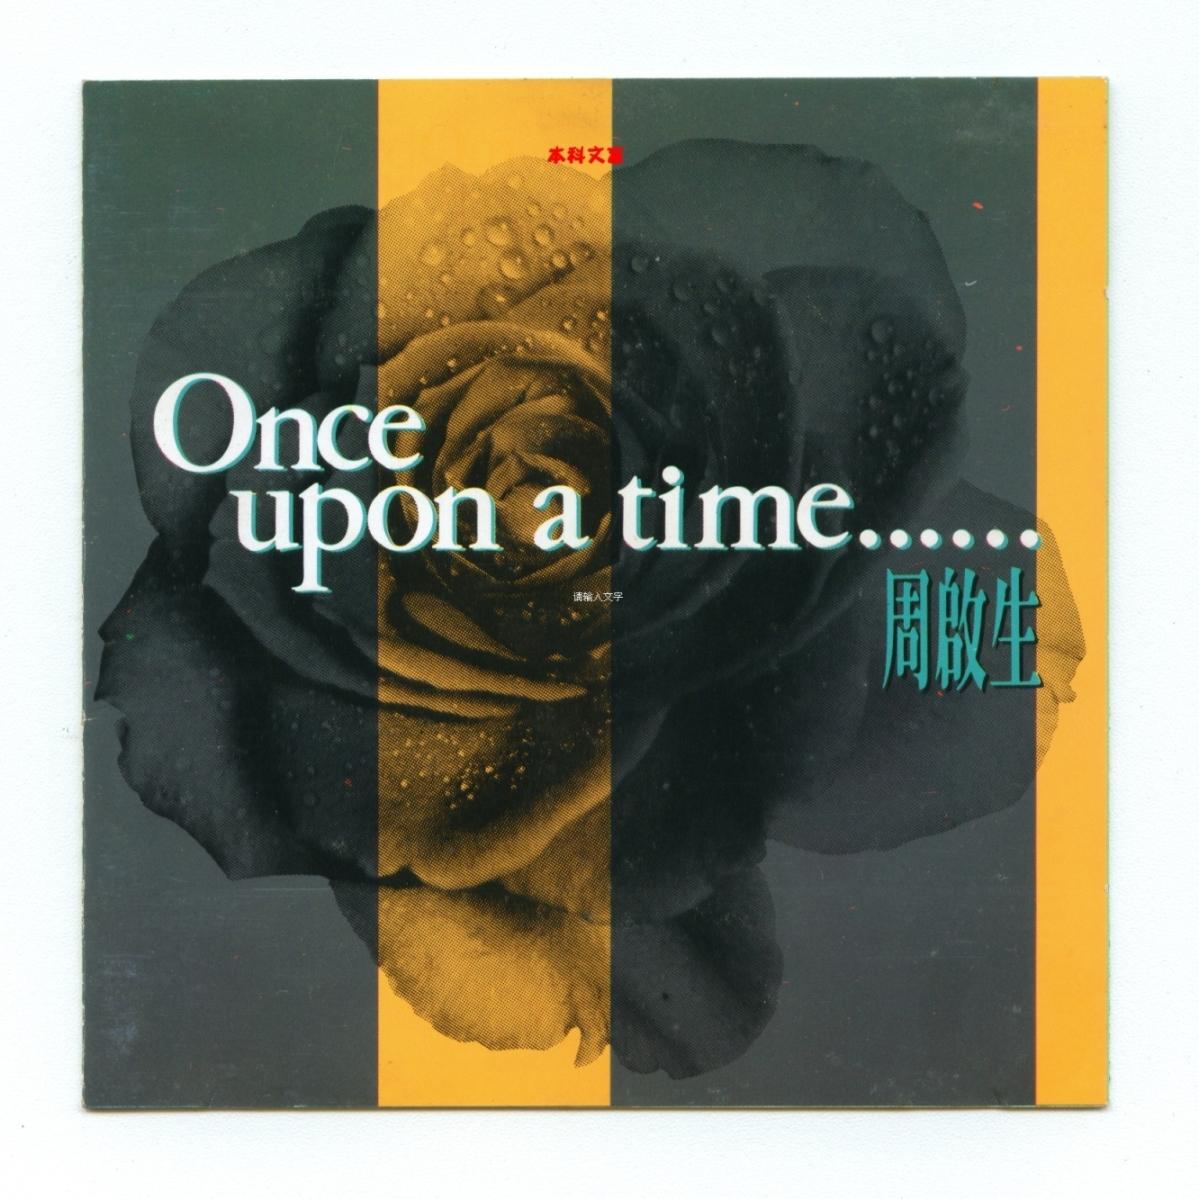 Once Upon A Time - Châu Khải Sinh